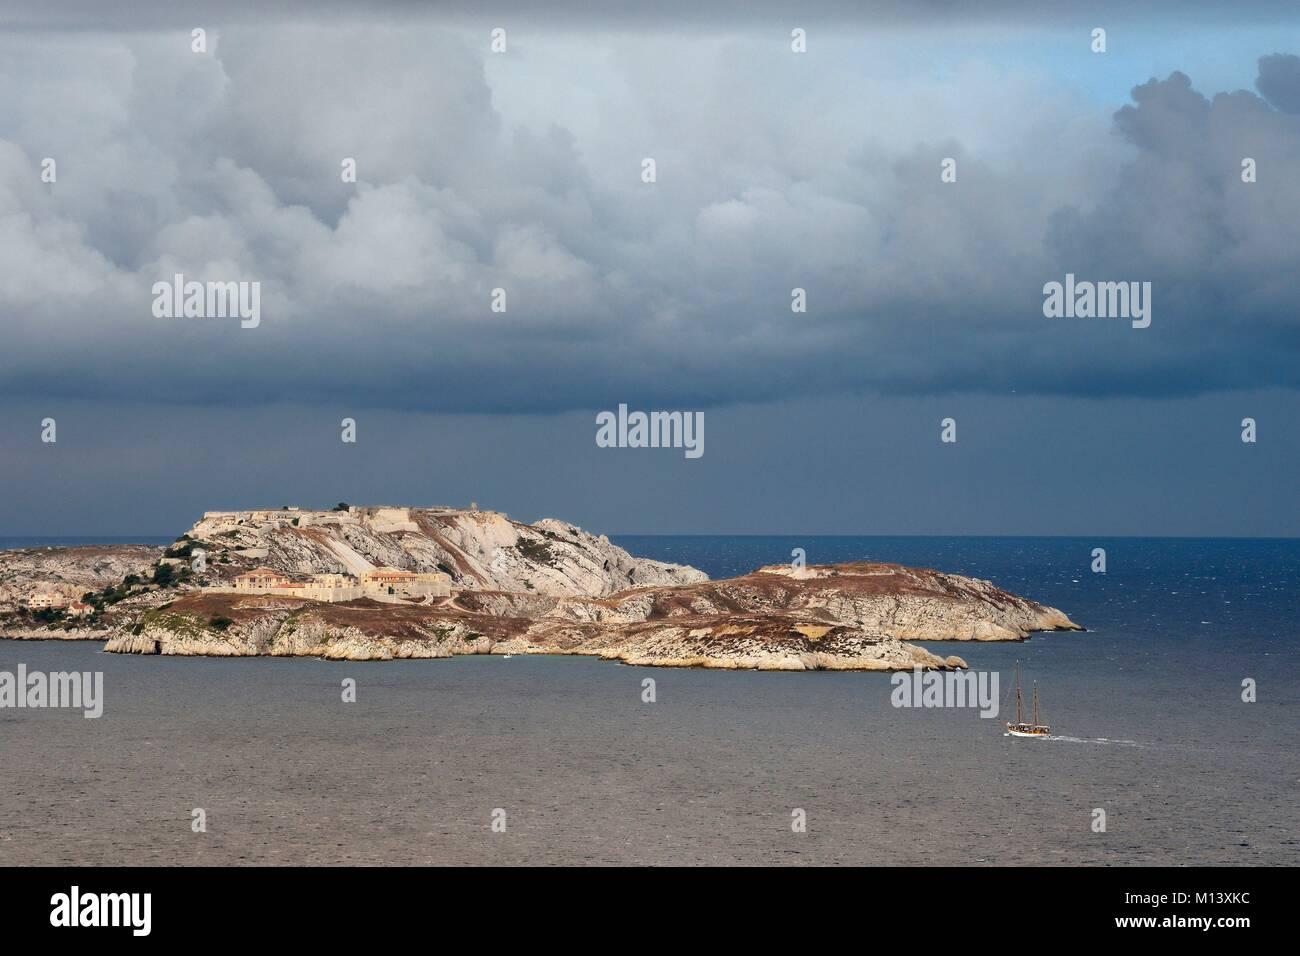 Frankreich, Bouches-du-Rhone, Marseille, Calanques Nationalpark, Archipel von Frioul-inseln, Ratonneau Insel, die Stockbild